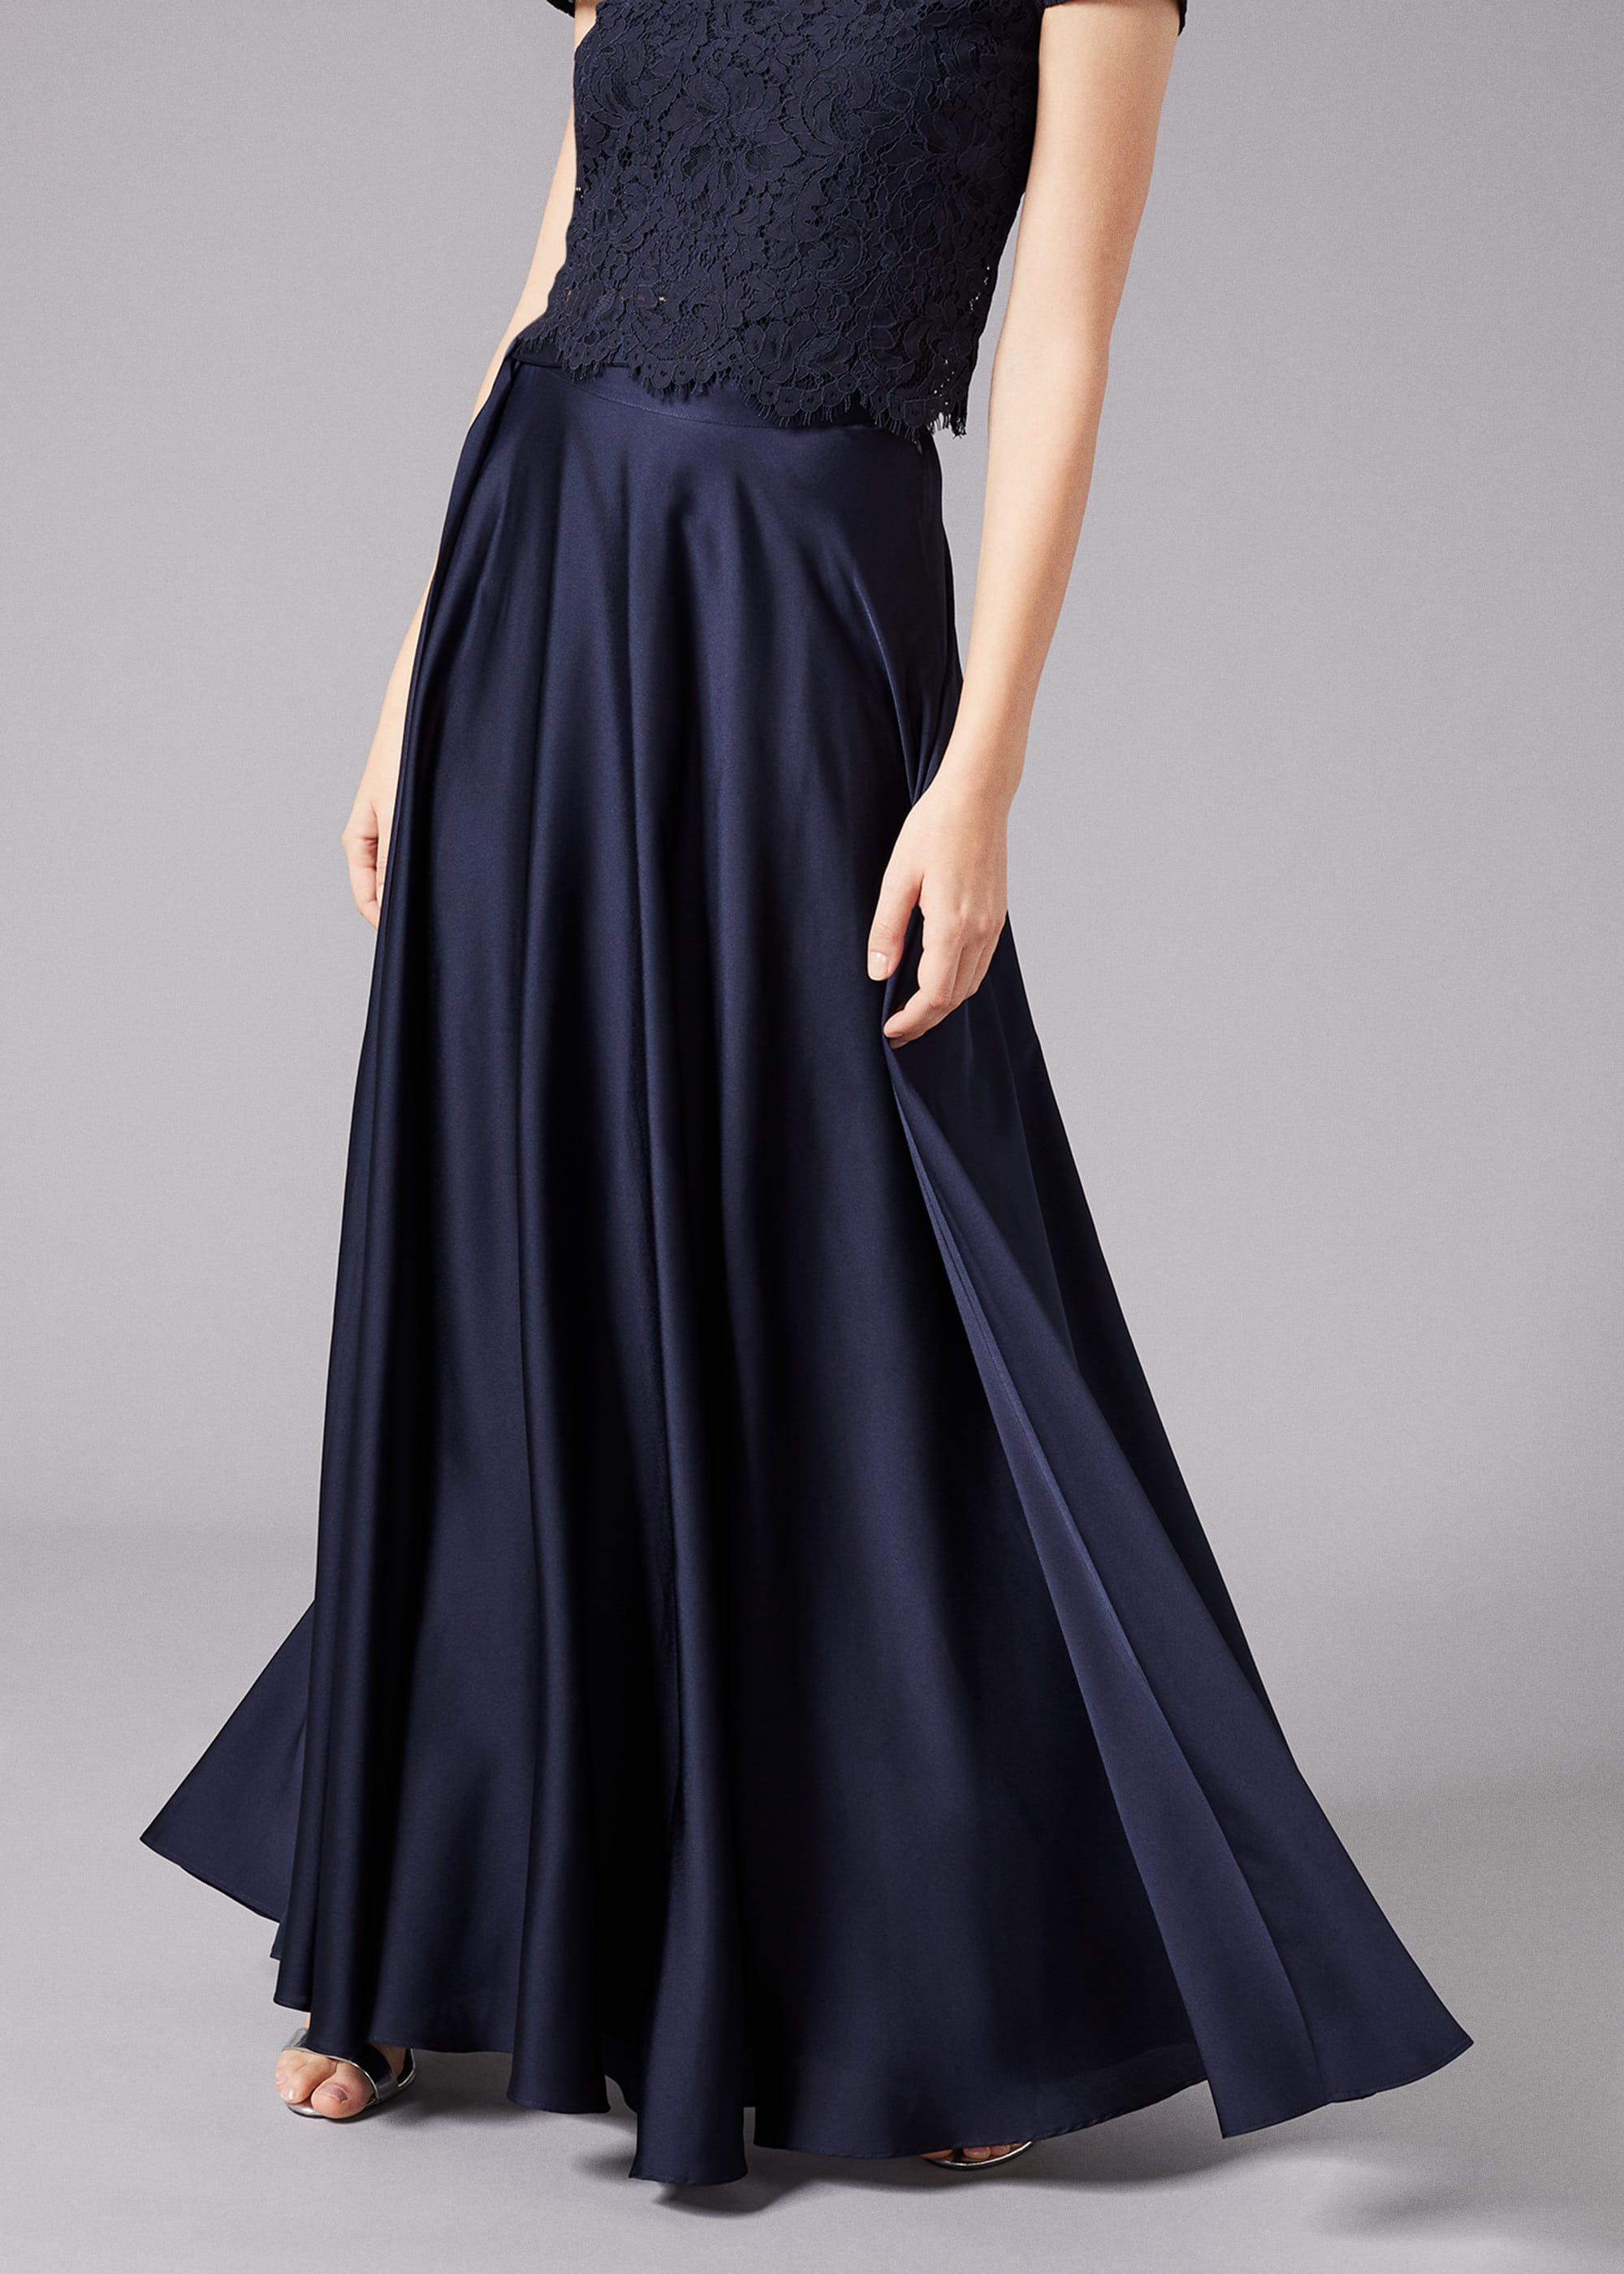 Phase Eight Women Zoe Satin Maxi Skirt